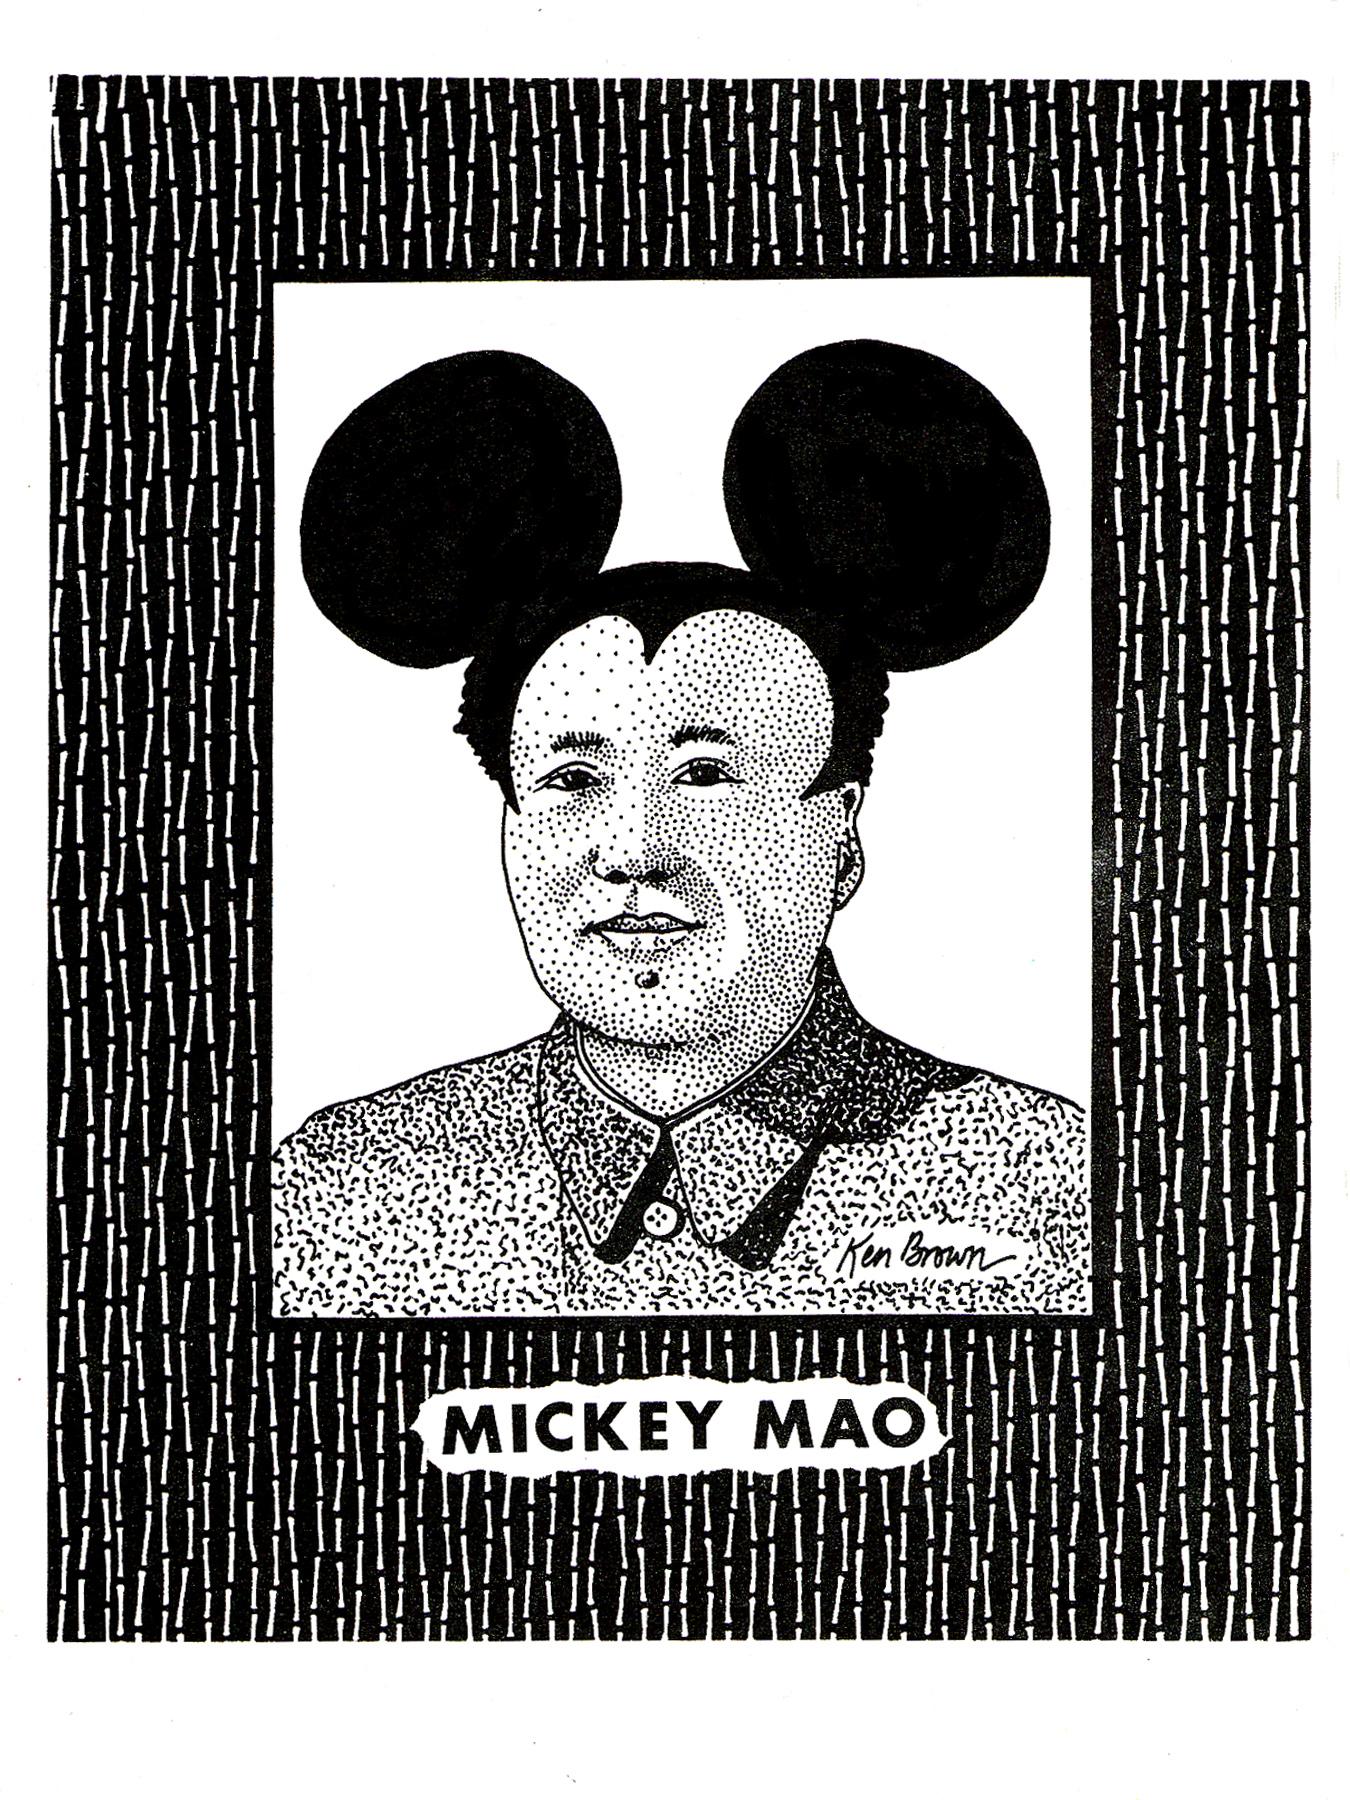 PC-CARTOON B_W-MICKEY MAO.jpg